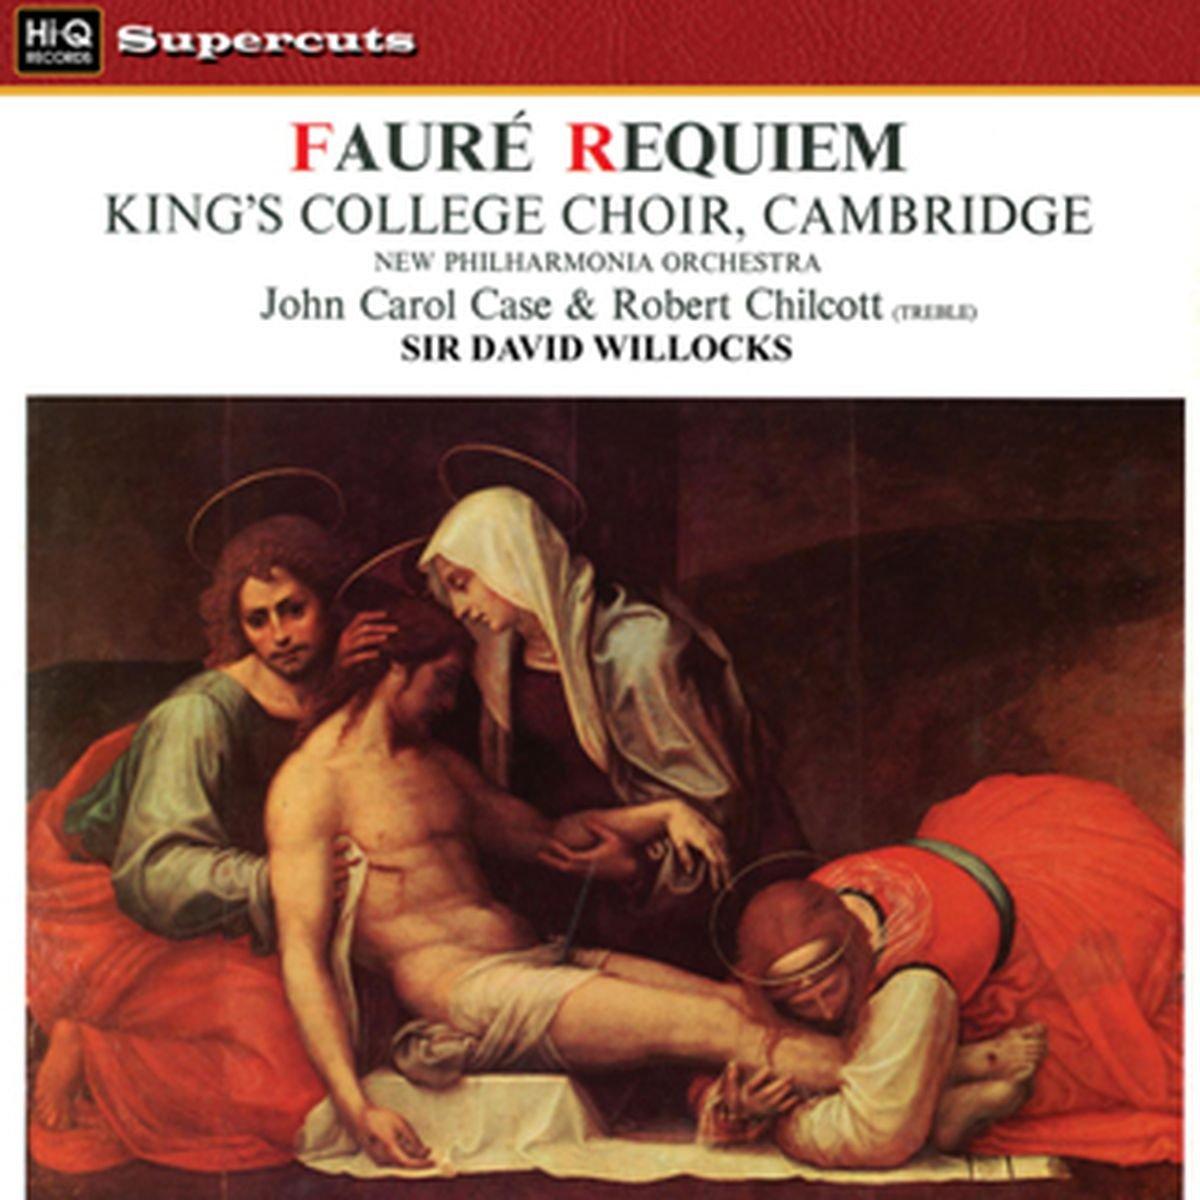 Faure Requiem [12 inch Analog]                                                                                                                                                                                                                                                    <span class=